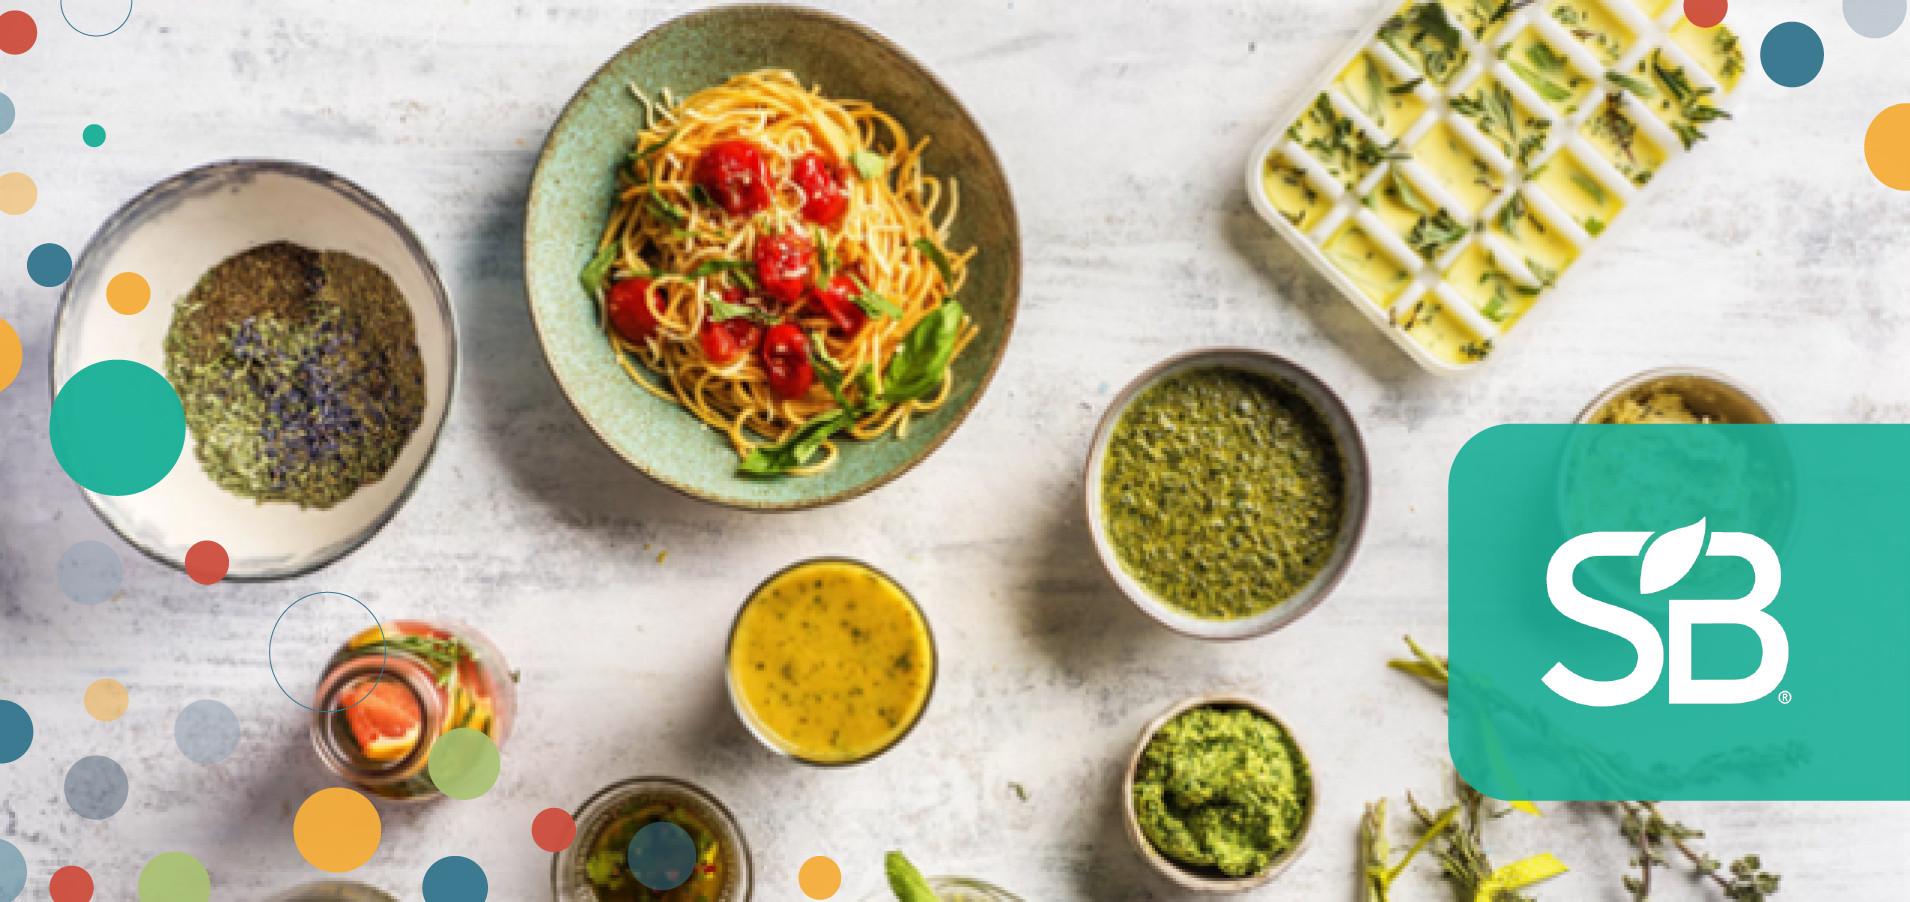 Trending: More Startups Revolutionizing the Food Industry